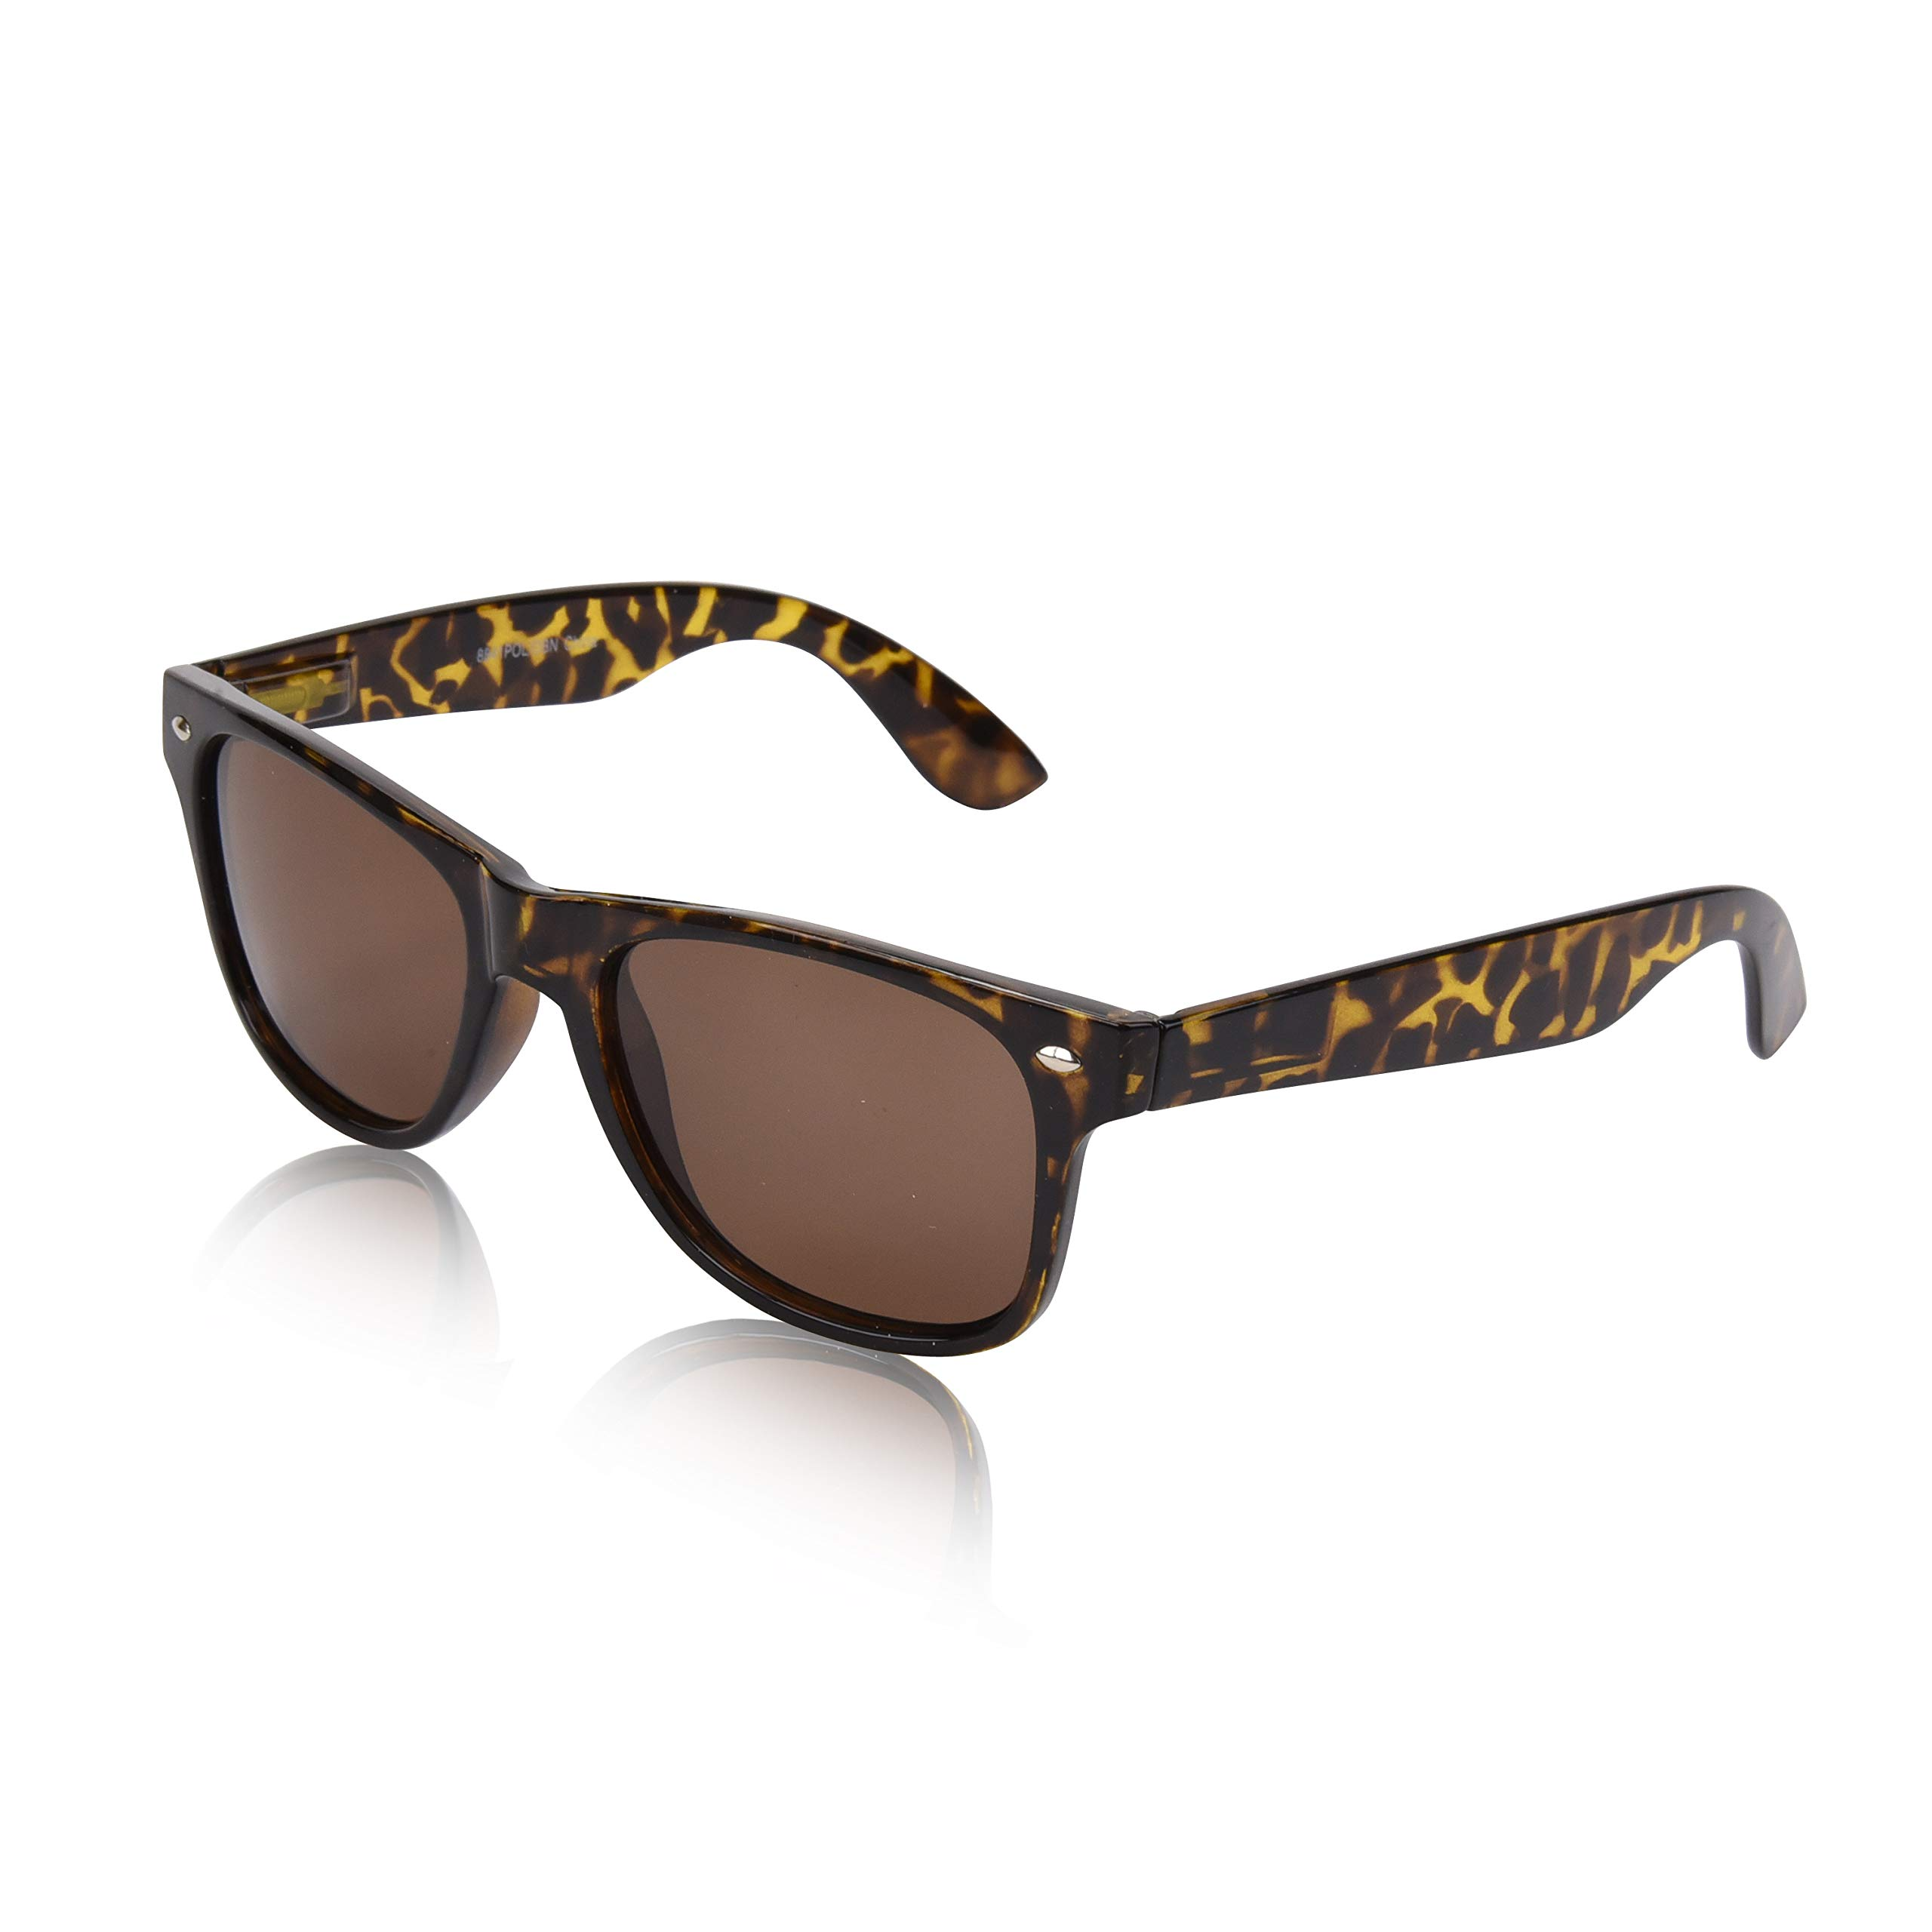 Classic Sunglasses Polarized For Man Woman UV 400 Protection Eyeglasses Tortoise by SunnyPro